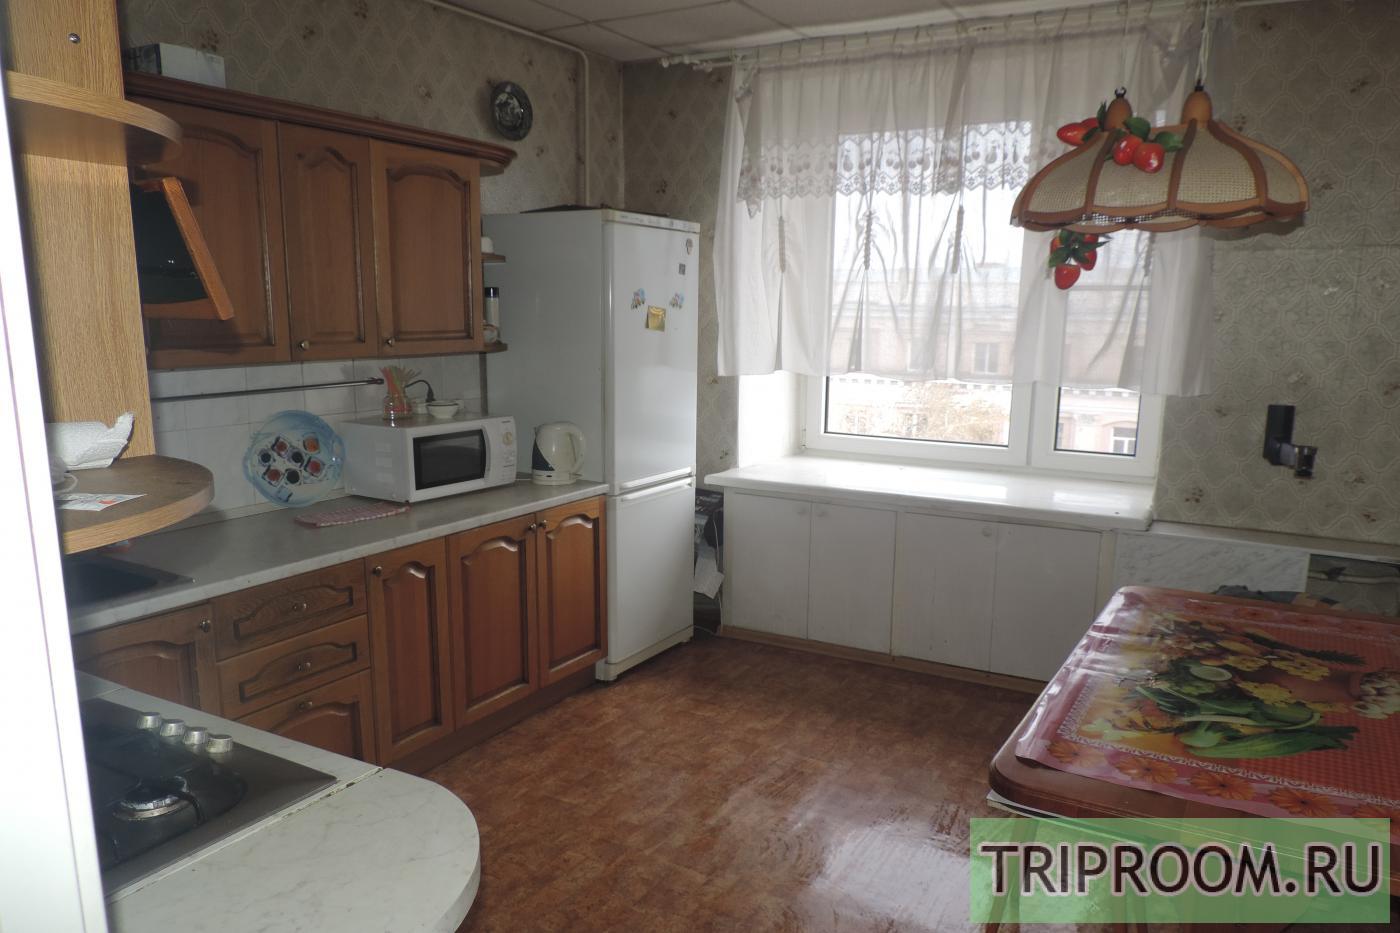 2-комнатная квартира посуточно (вариант № 11543), ул. Цвиллинга улица, фото № 5